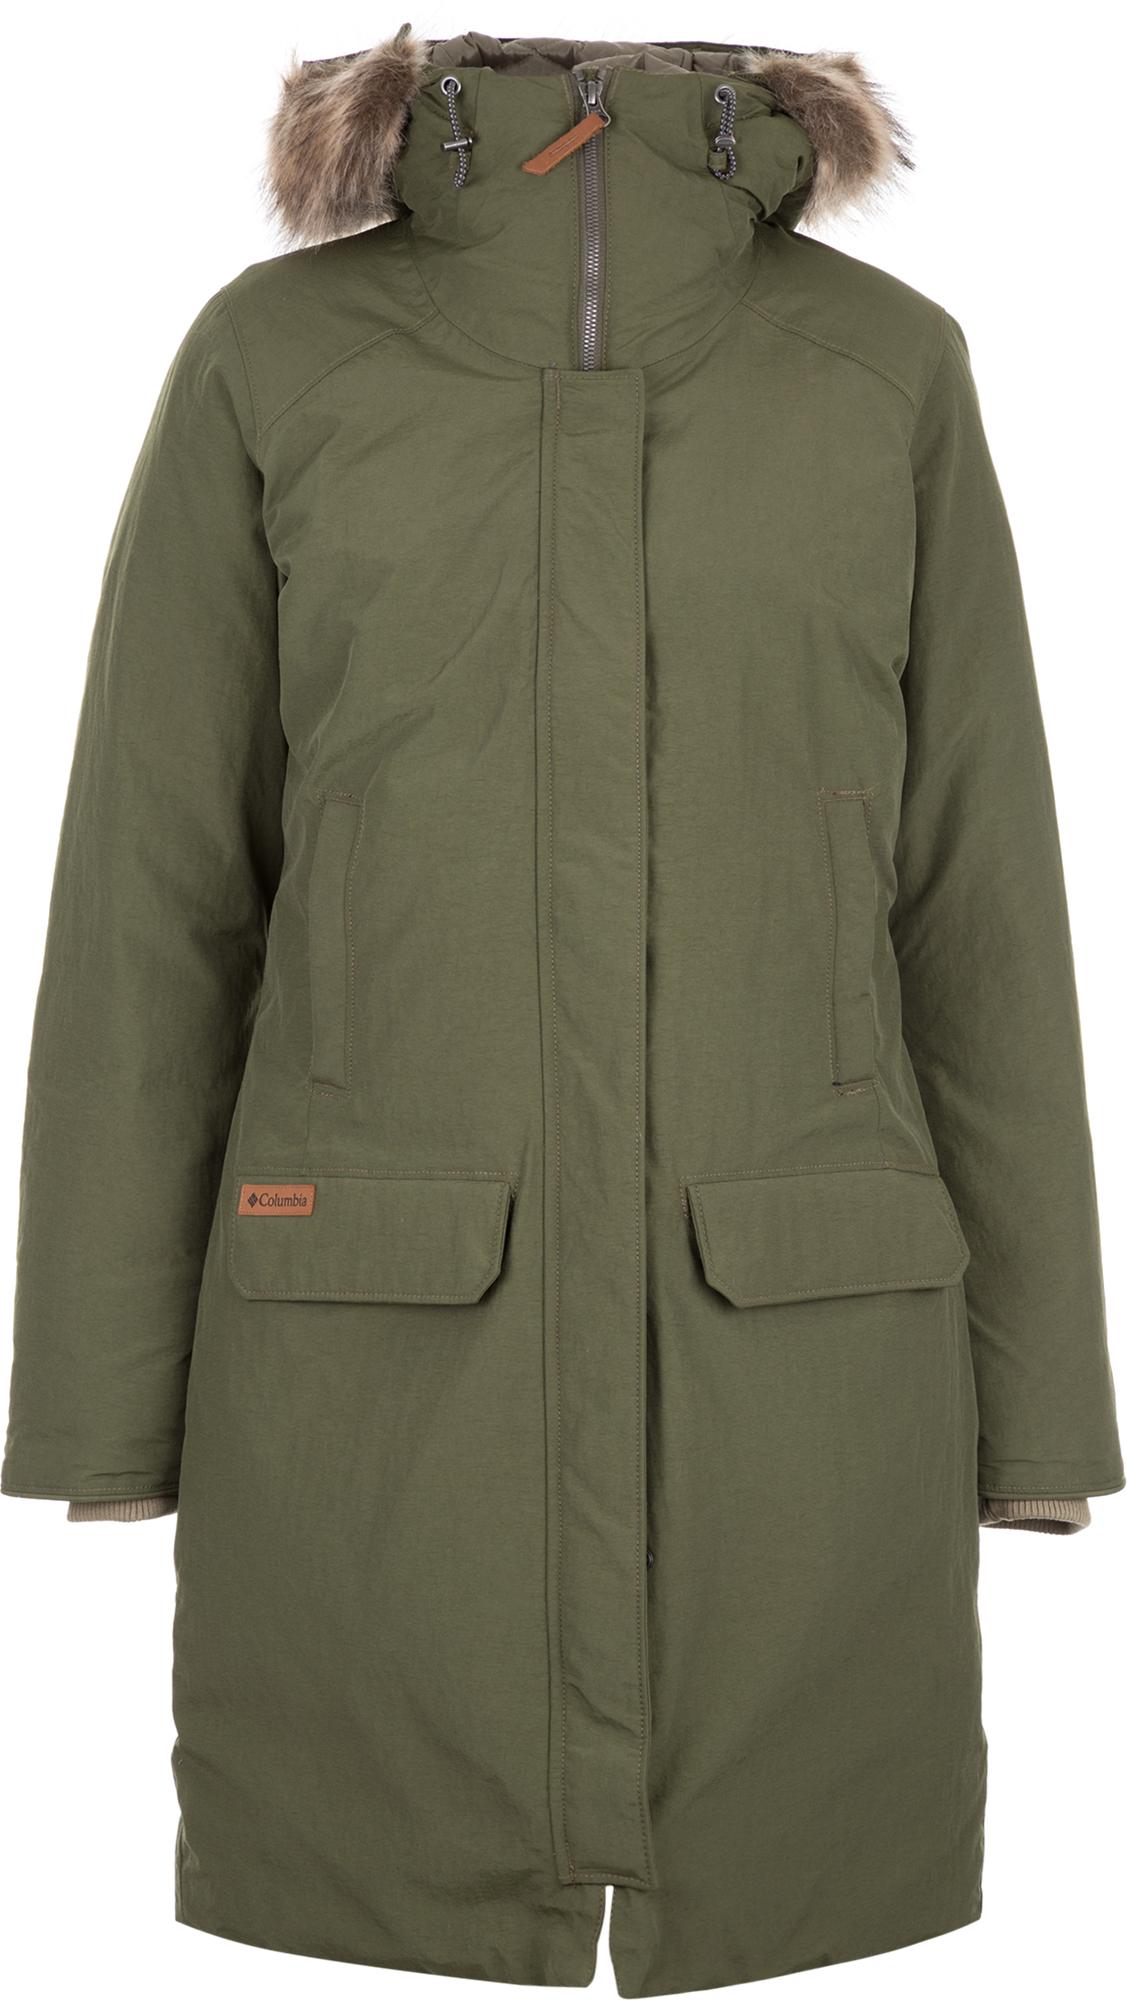 Columbia Куртка пуховая женская Columbia Alpine Escape 550 Turbodown,  размер 48 columbia куртка пуховая женская 96d0f445ac6